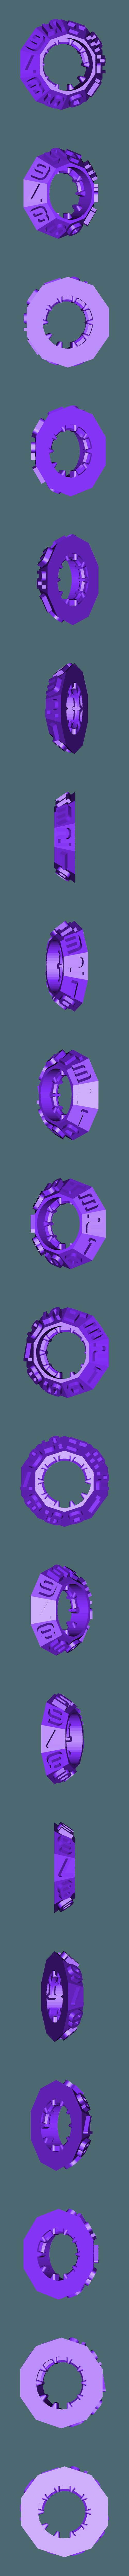 5R-6L.stl Download free STL file Latch Cryptex - Cerrojo • 3D printable design, xutano